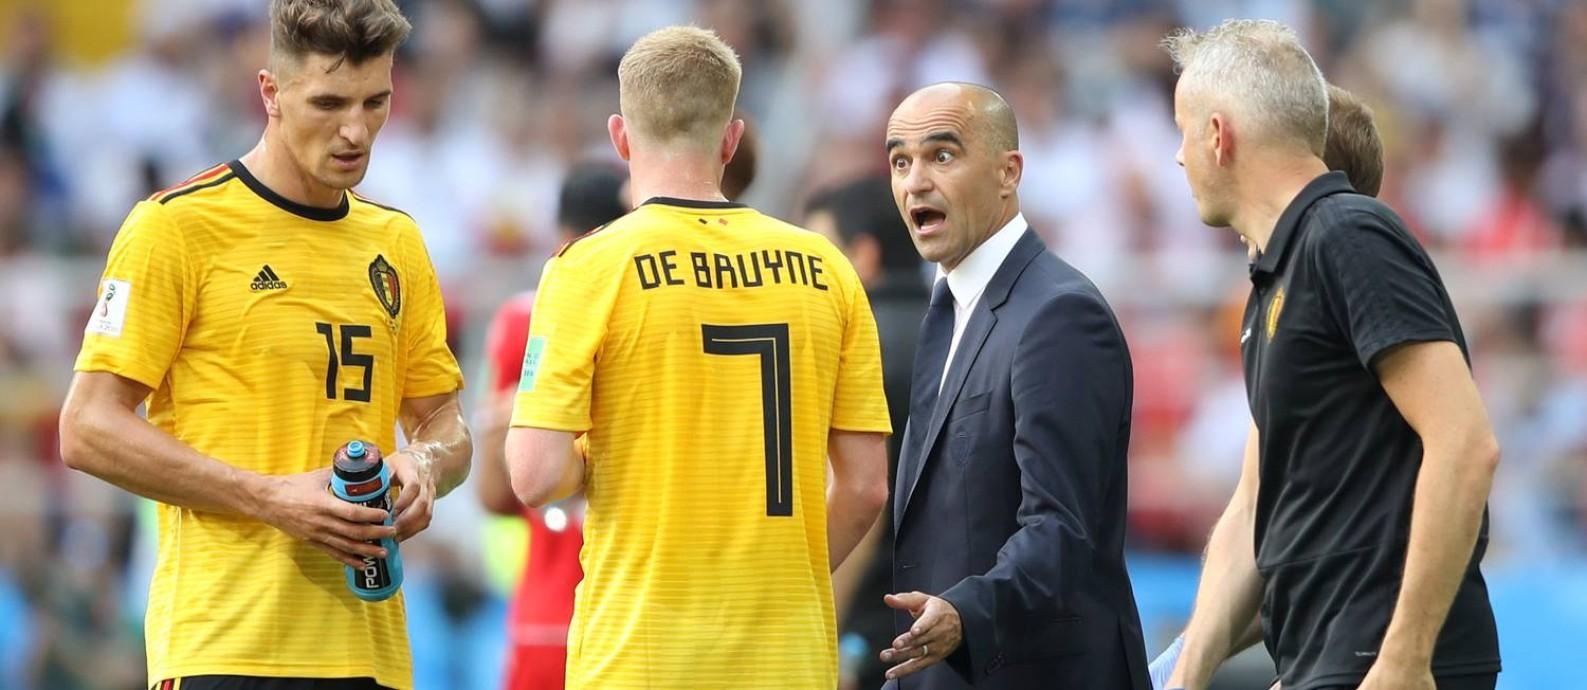 Papo entre Roberto Martínez e Kevin de Bruyne na vitória belga contra a Tunísia Foto: CARL RECINE / REUTERS